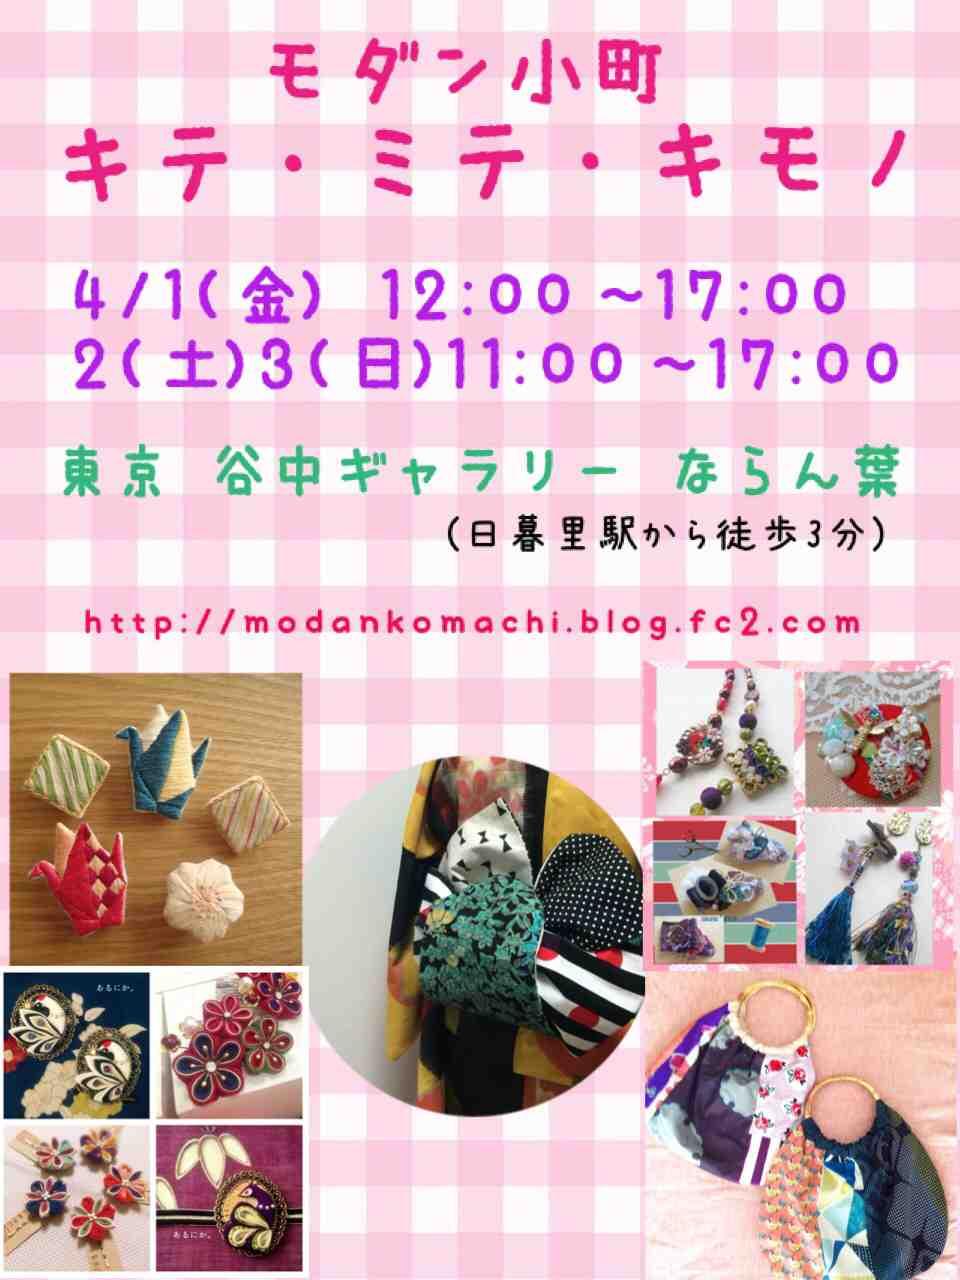 fc2blog_2016031709112397d.jpg